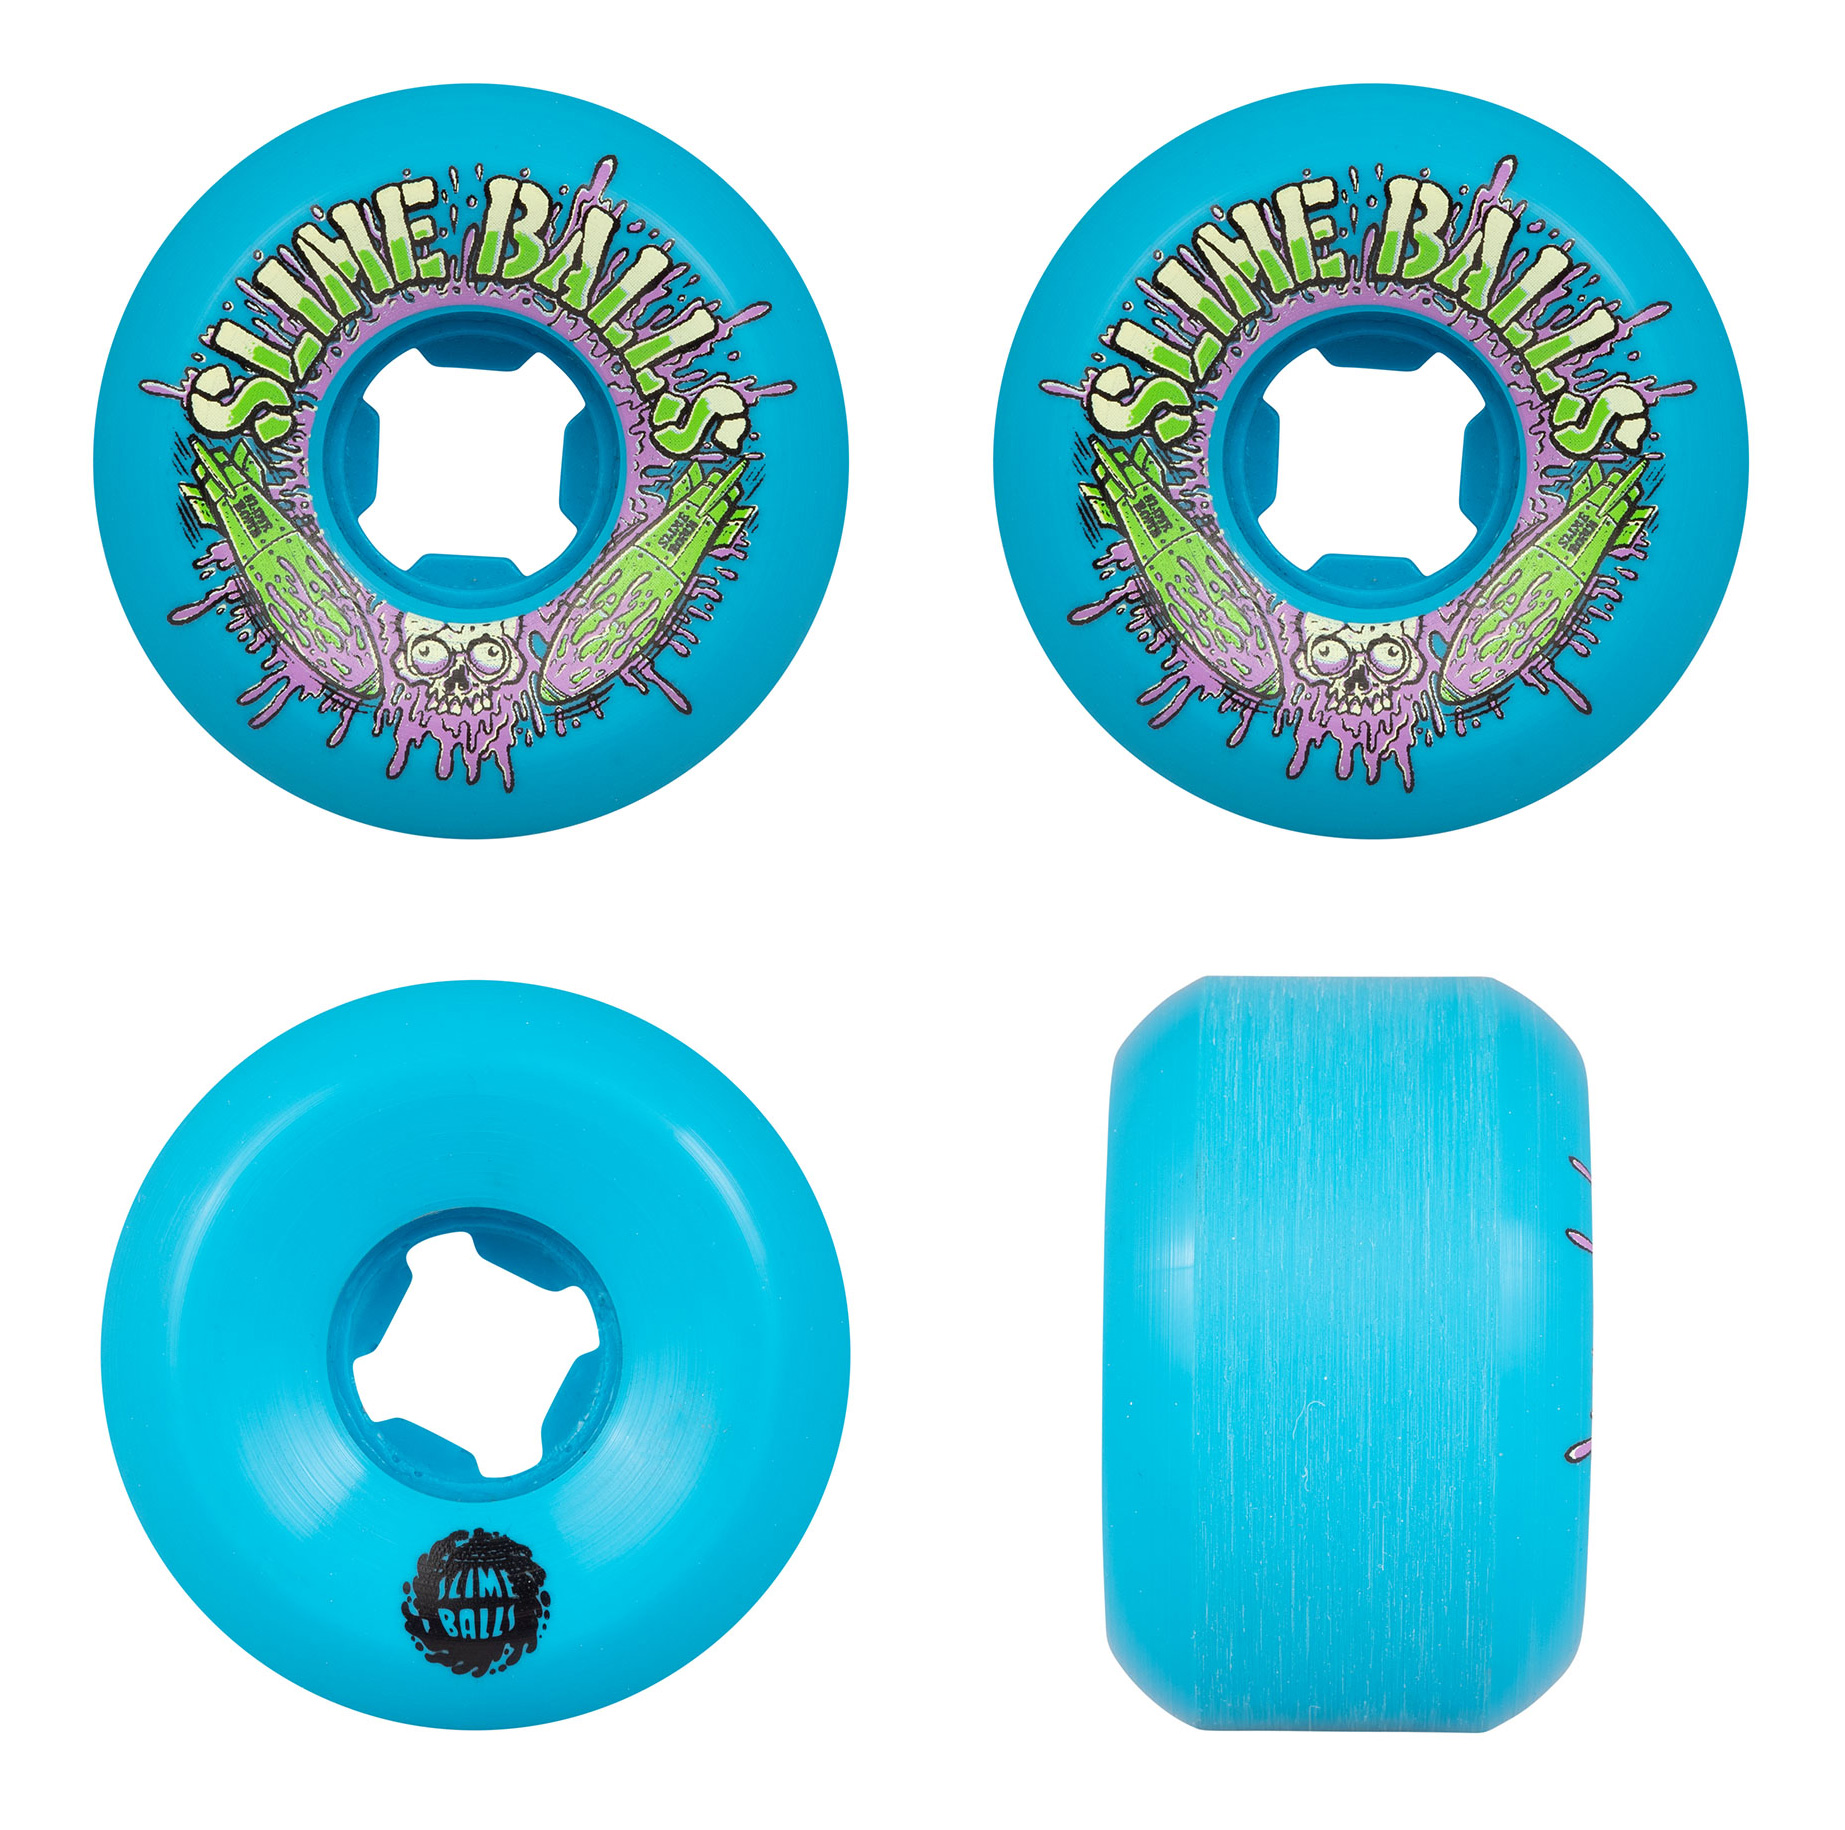 Santa Cruz Skateboards Slimeballs Slime Bombs Speed Balls Blue Skateboard Wheels Set of 4 56mm 99a